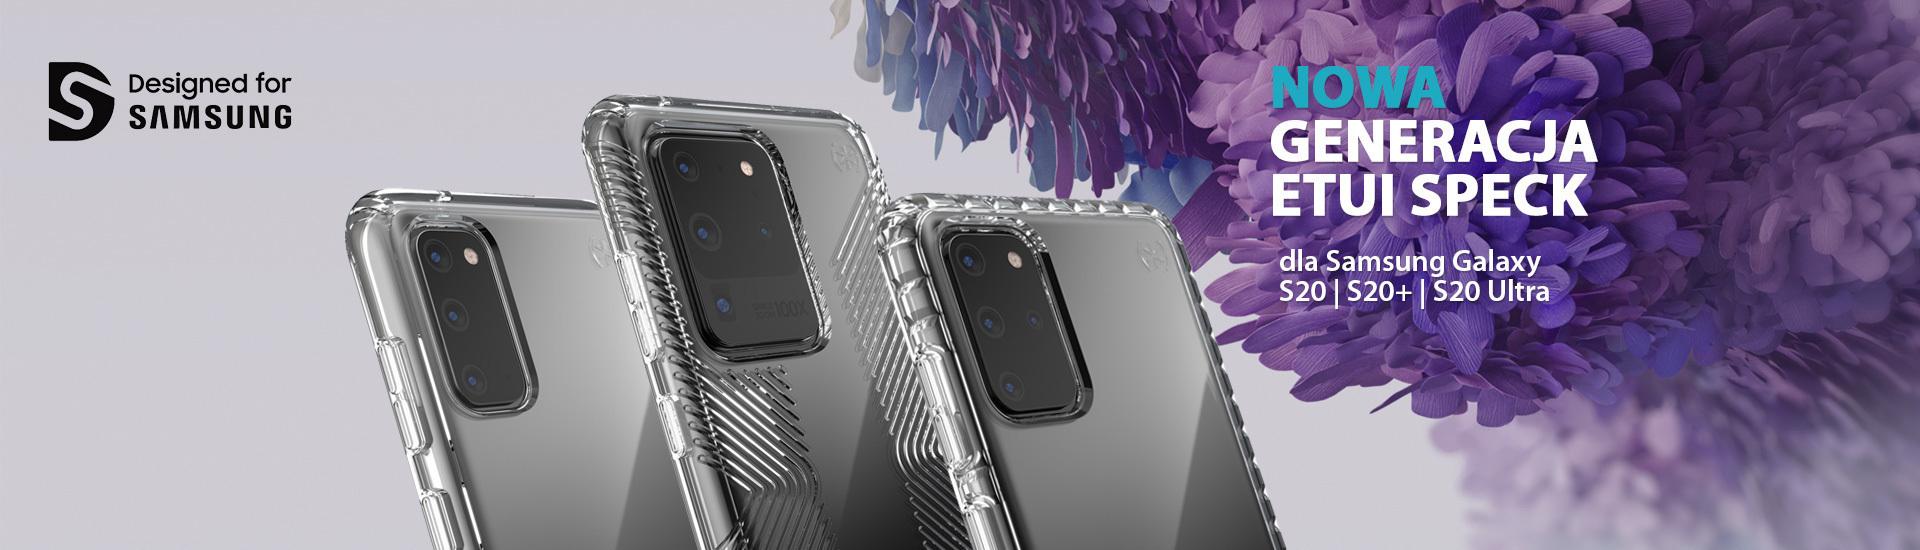 dla Samsung Galaxy S20, Galaxy S20+ oraz Galaxy S20 Ultra